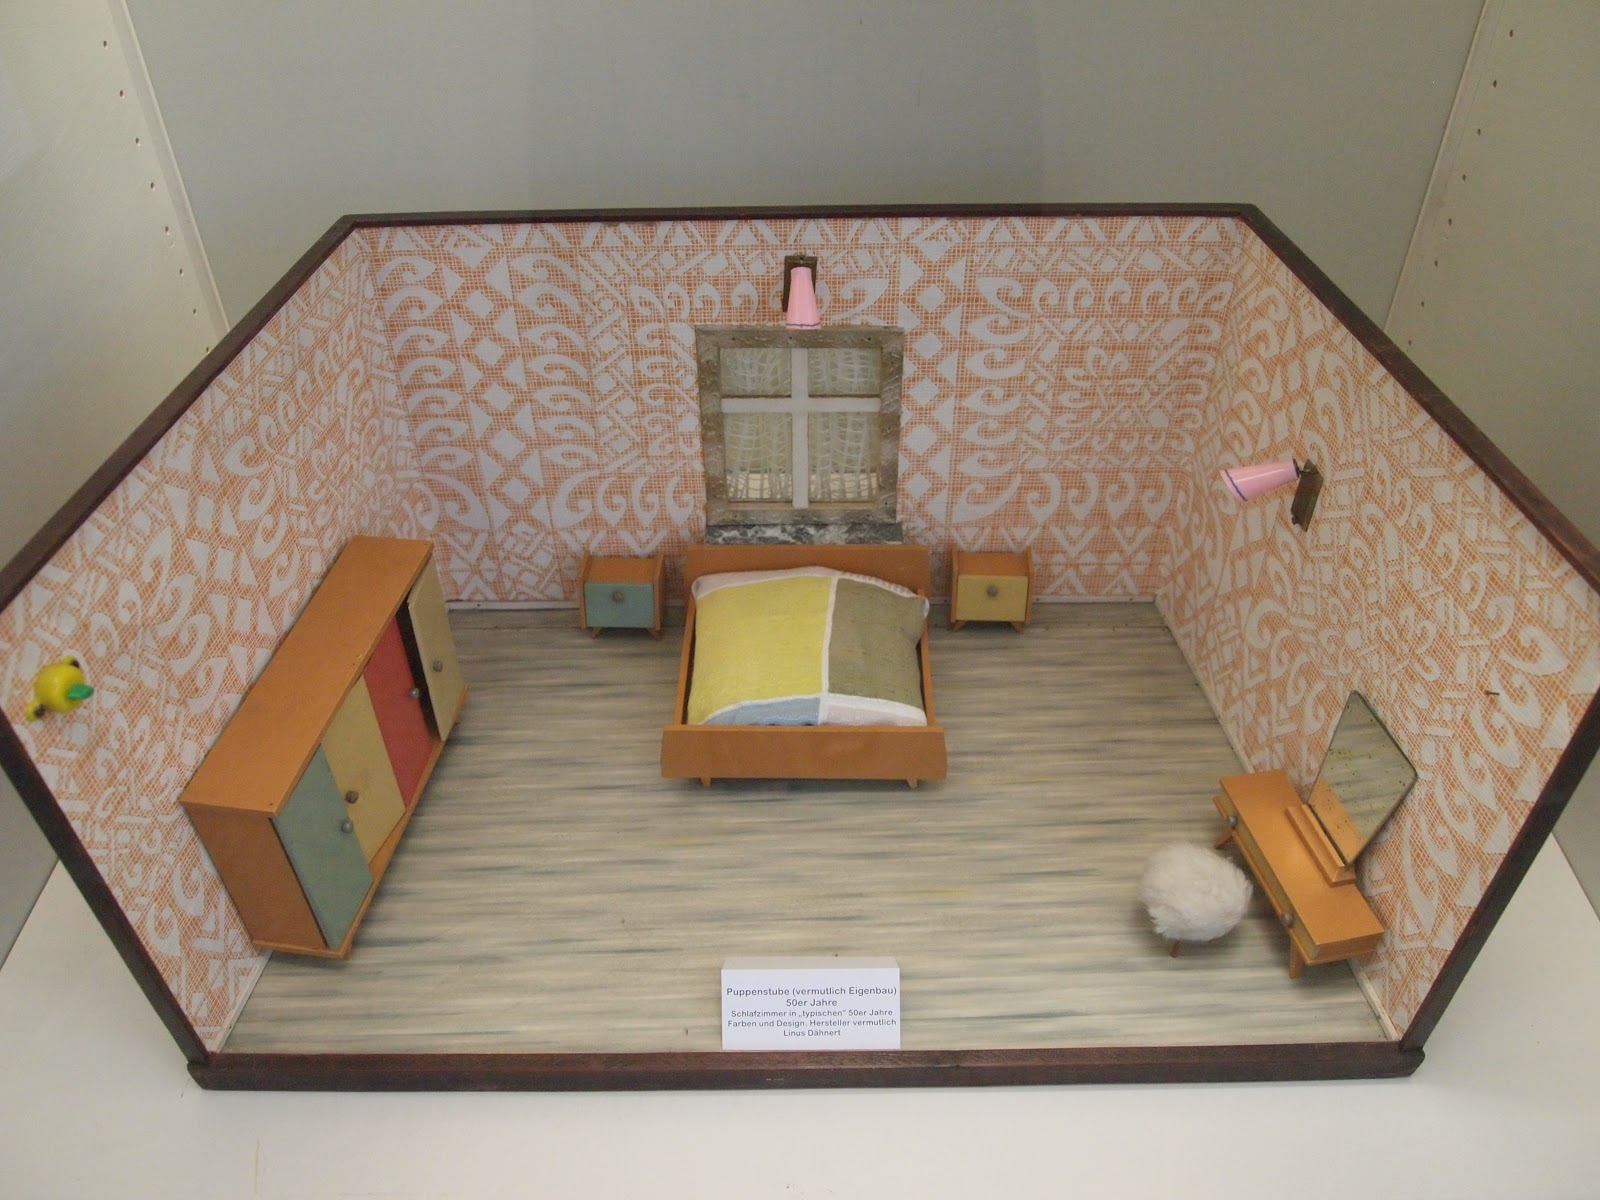 A dolls house exhibition in bergkamen by diepuppenstubensammlerin dolls 39 houses past present - Small bedroom spaces model ...